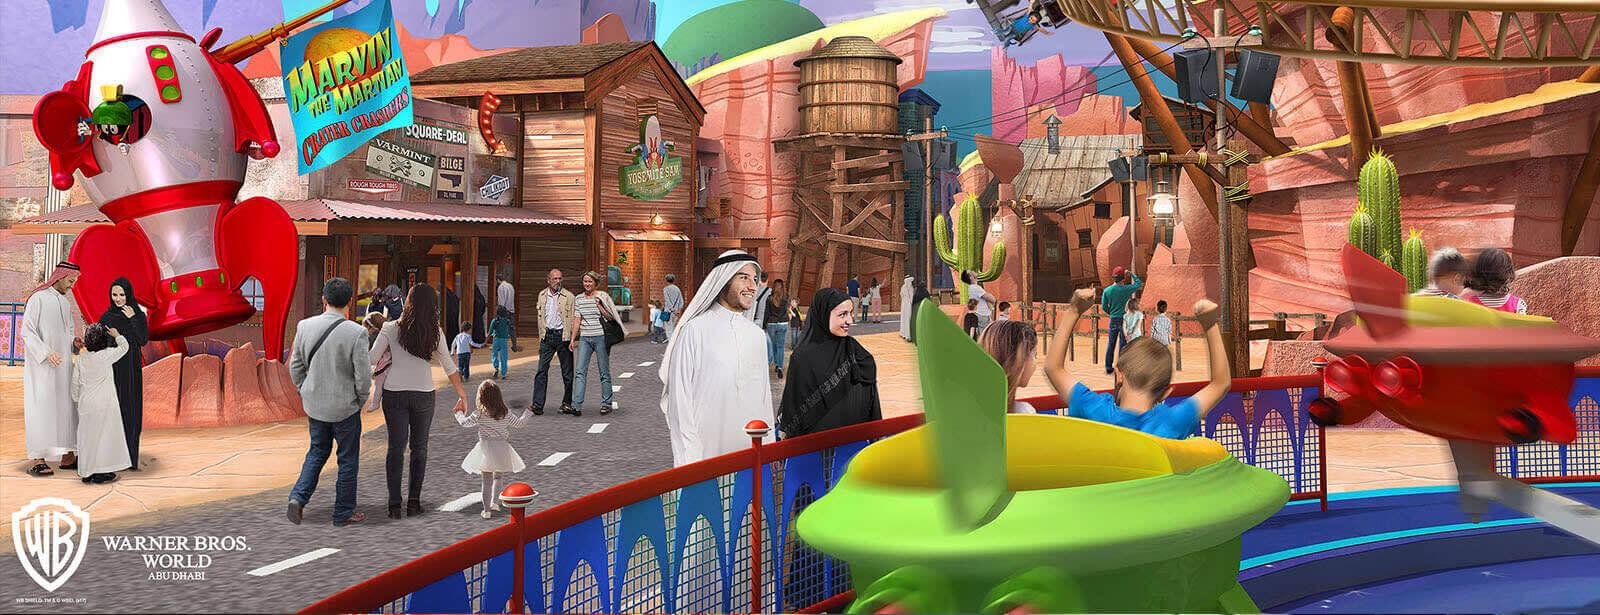 Warner Bros World Abu Dhabi will become your favorite nostalgic hit